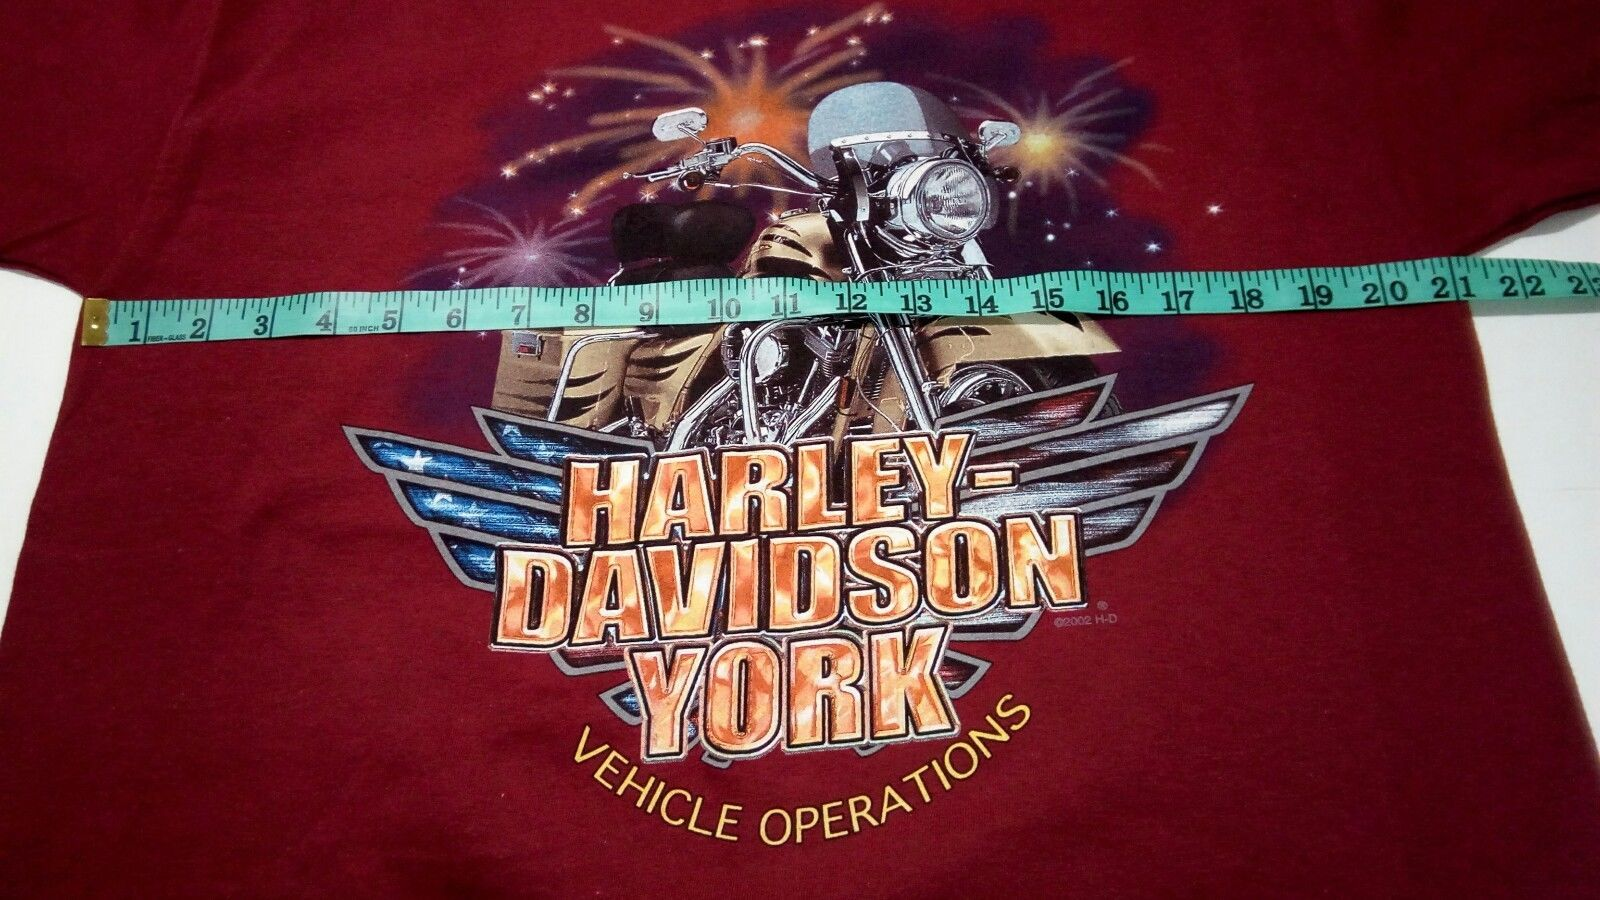 NWOT Harley Davidson York Vehicle Operations 2002 Men's L Red Hanes Beefy TShirt image 9